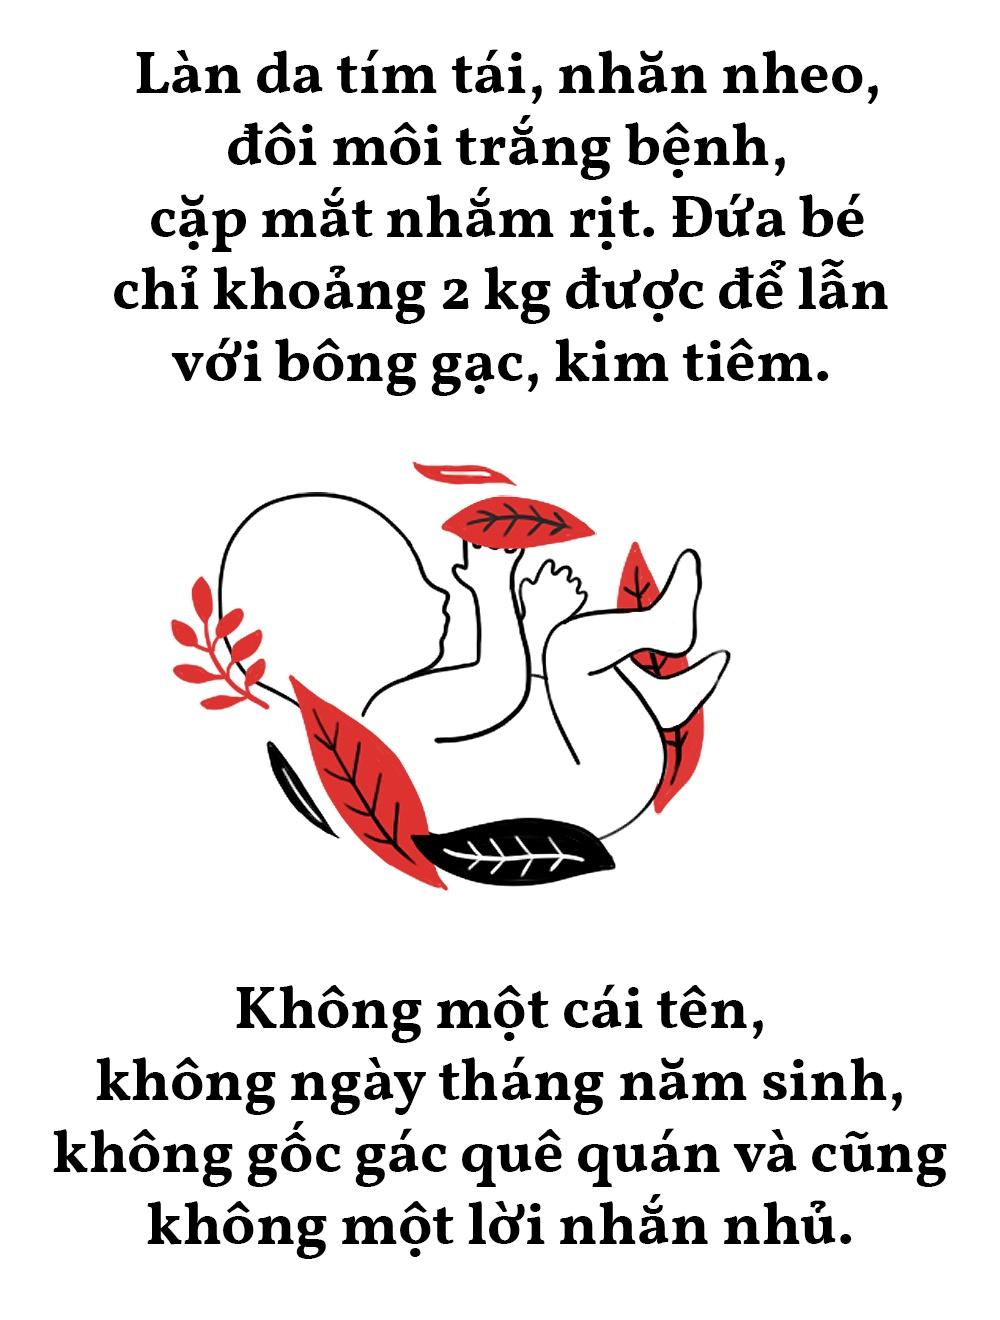 nan pha thai o Viet Nam anh 9